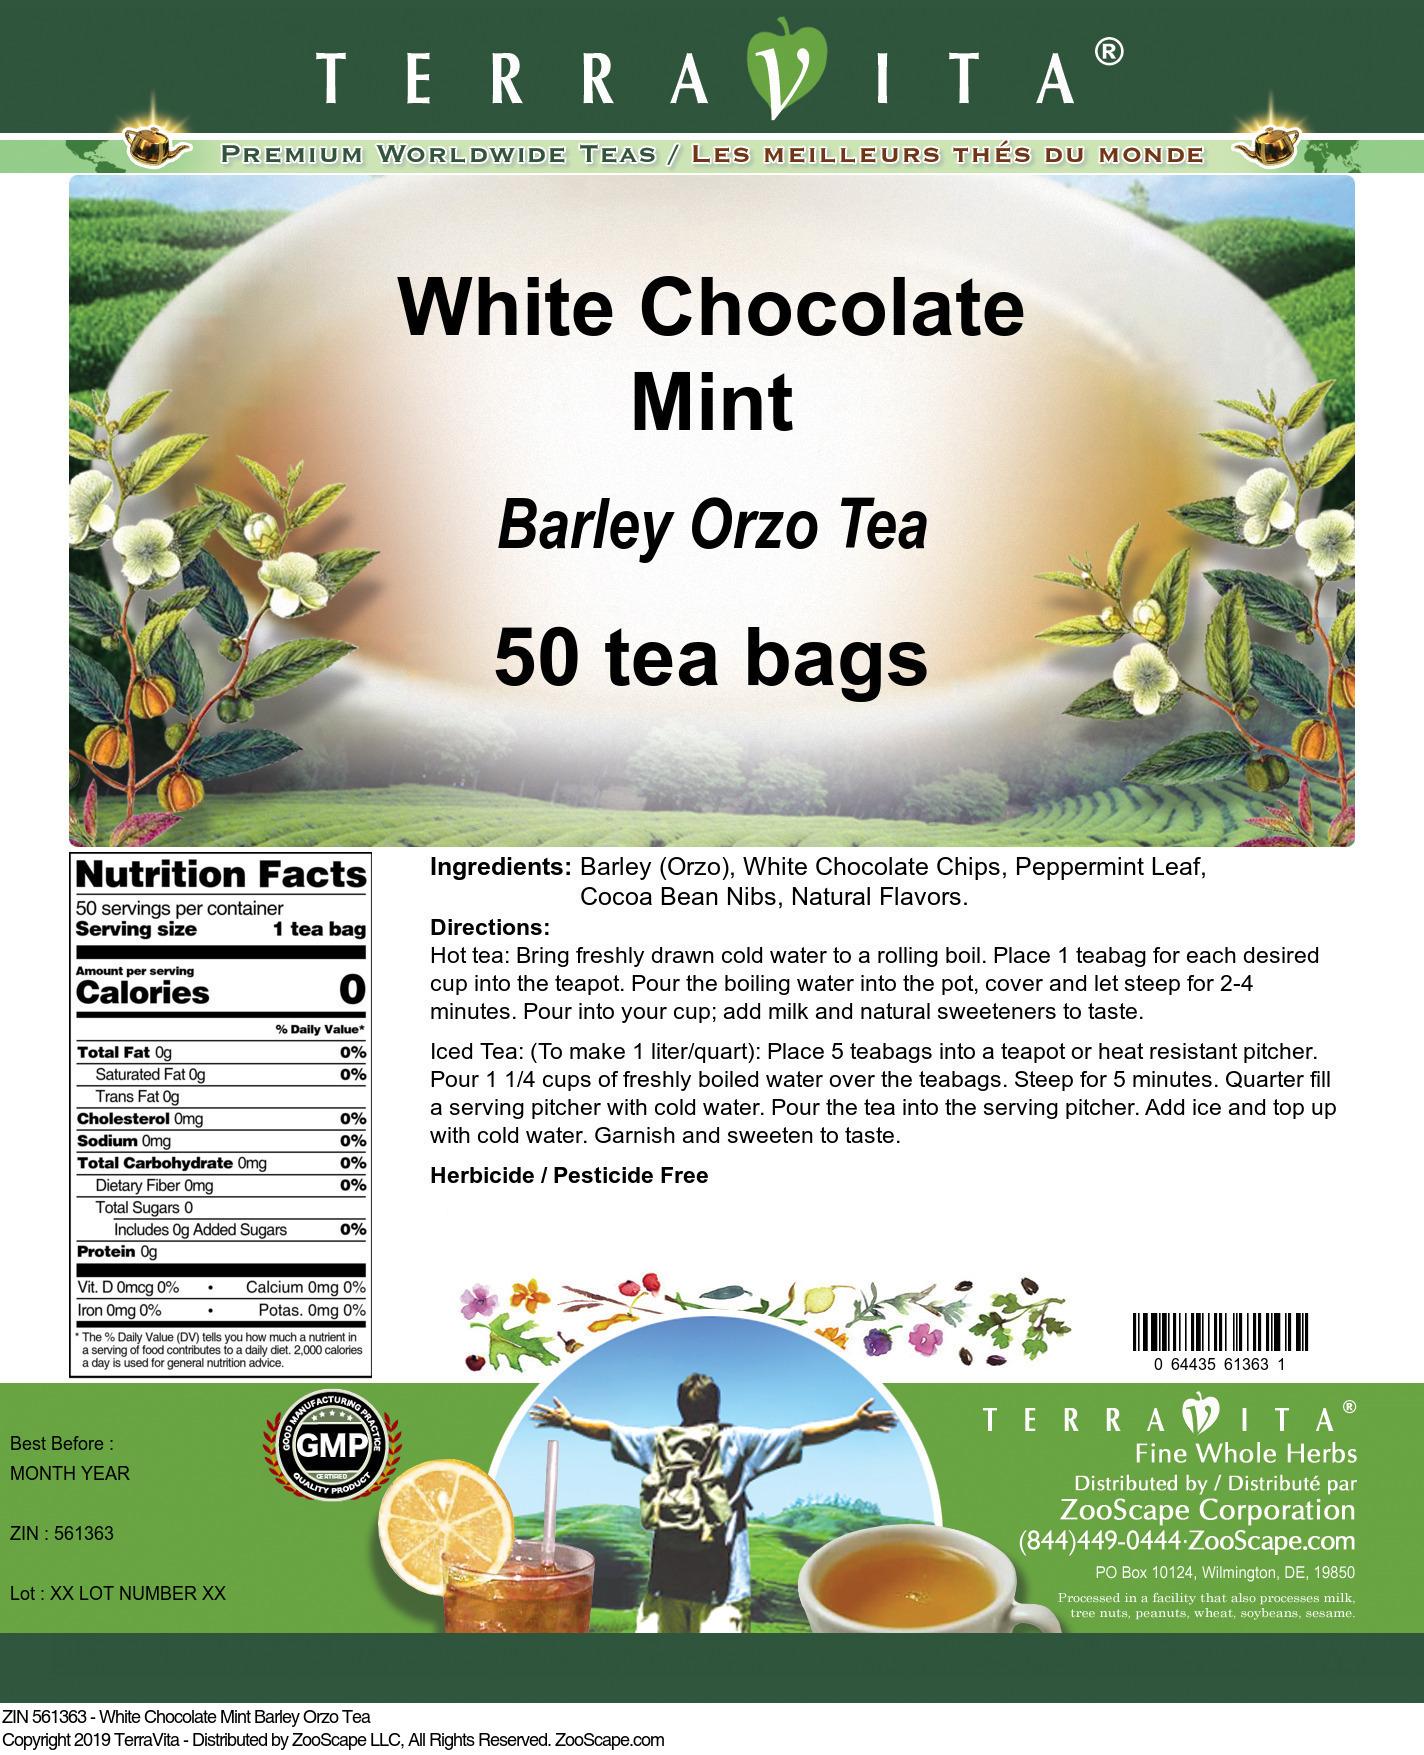 White Chocolate Mint Barley Orzo